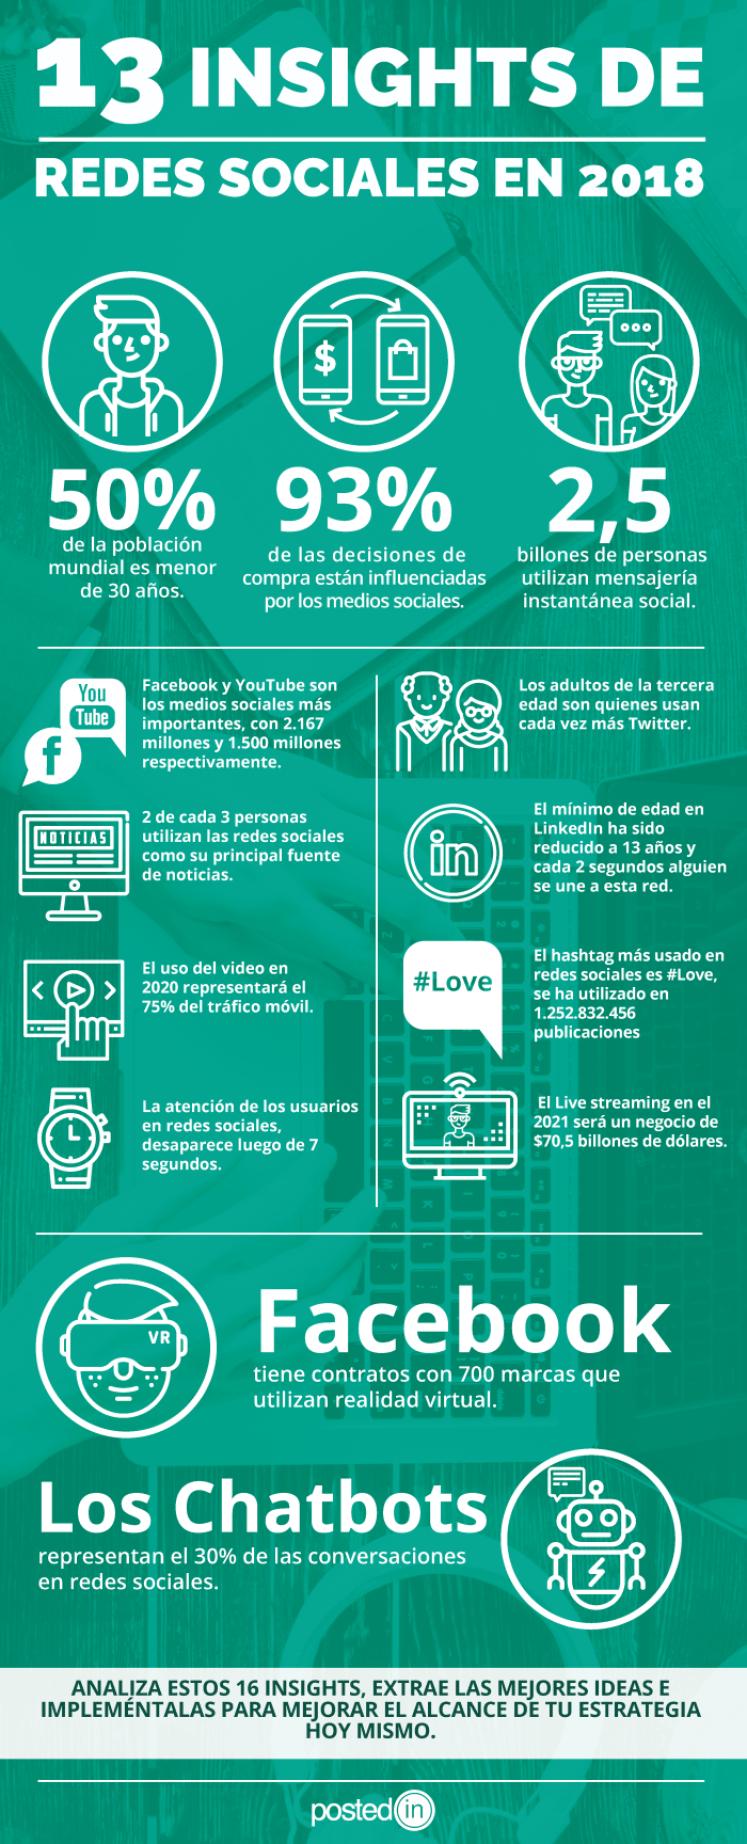 13 insights de Redes Sociales #infografia #infographic #socialmedia